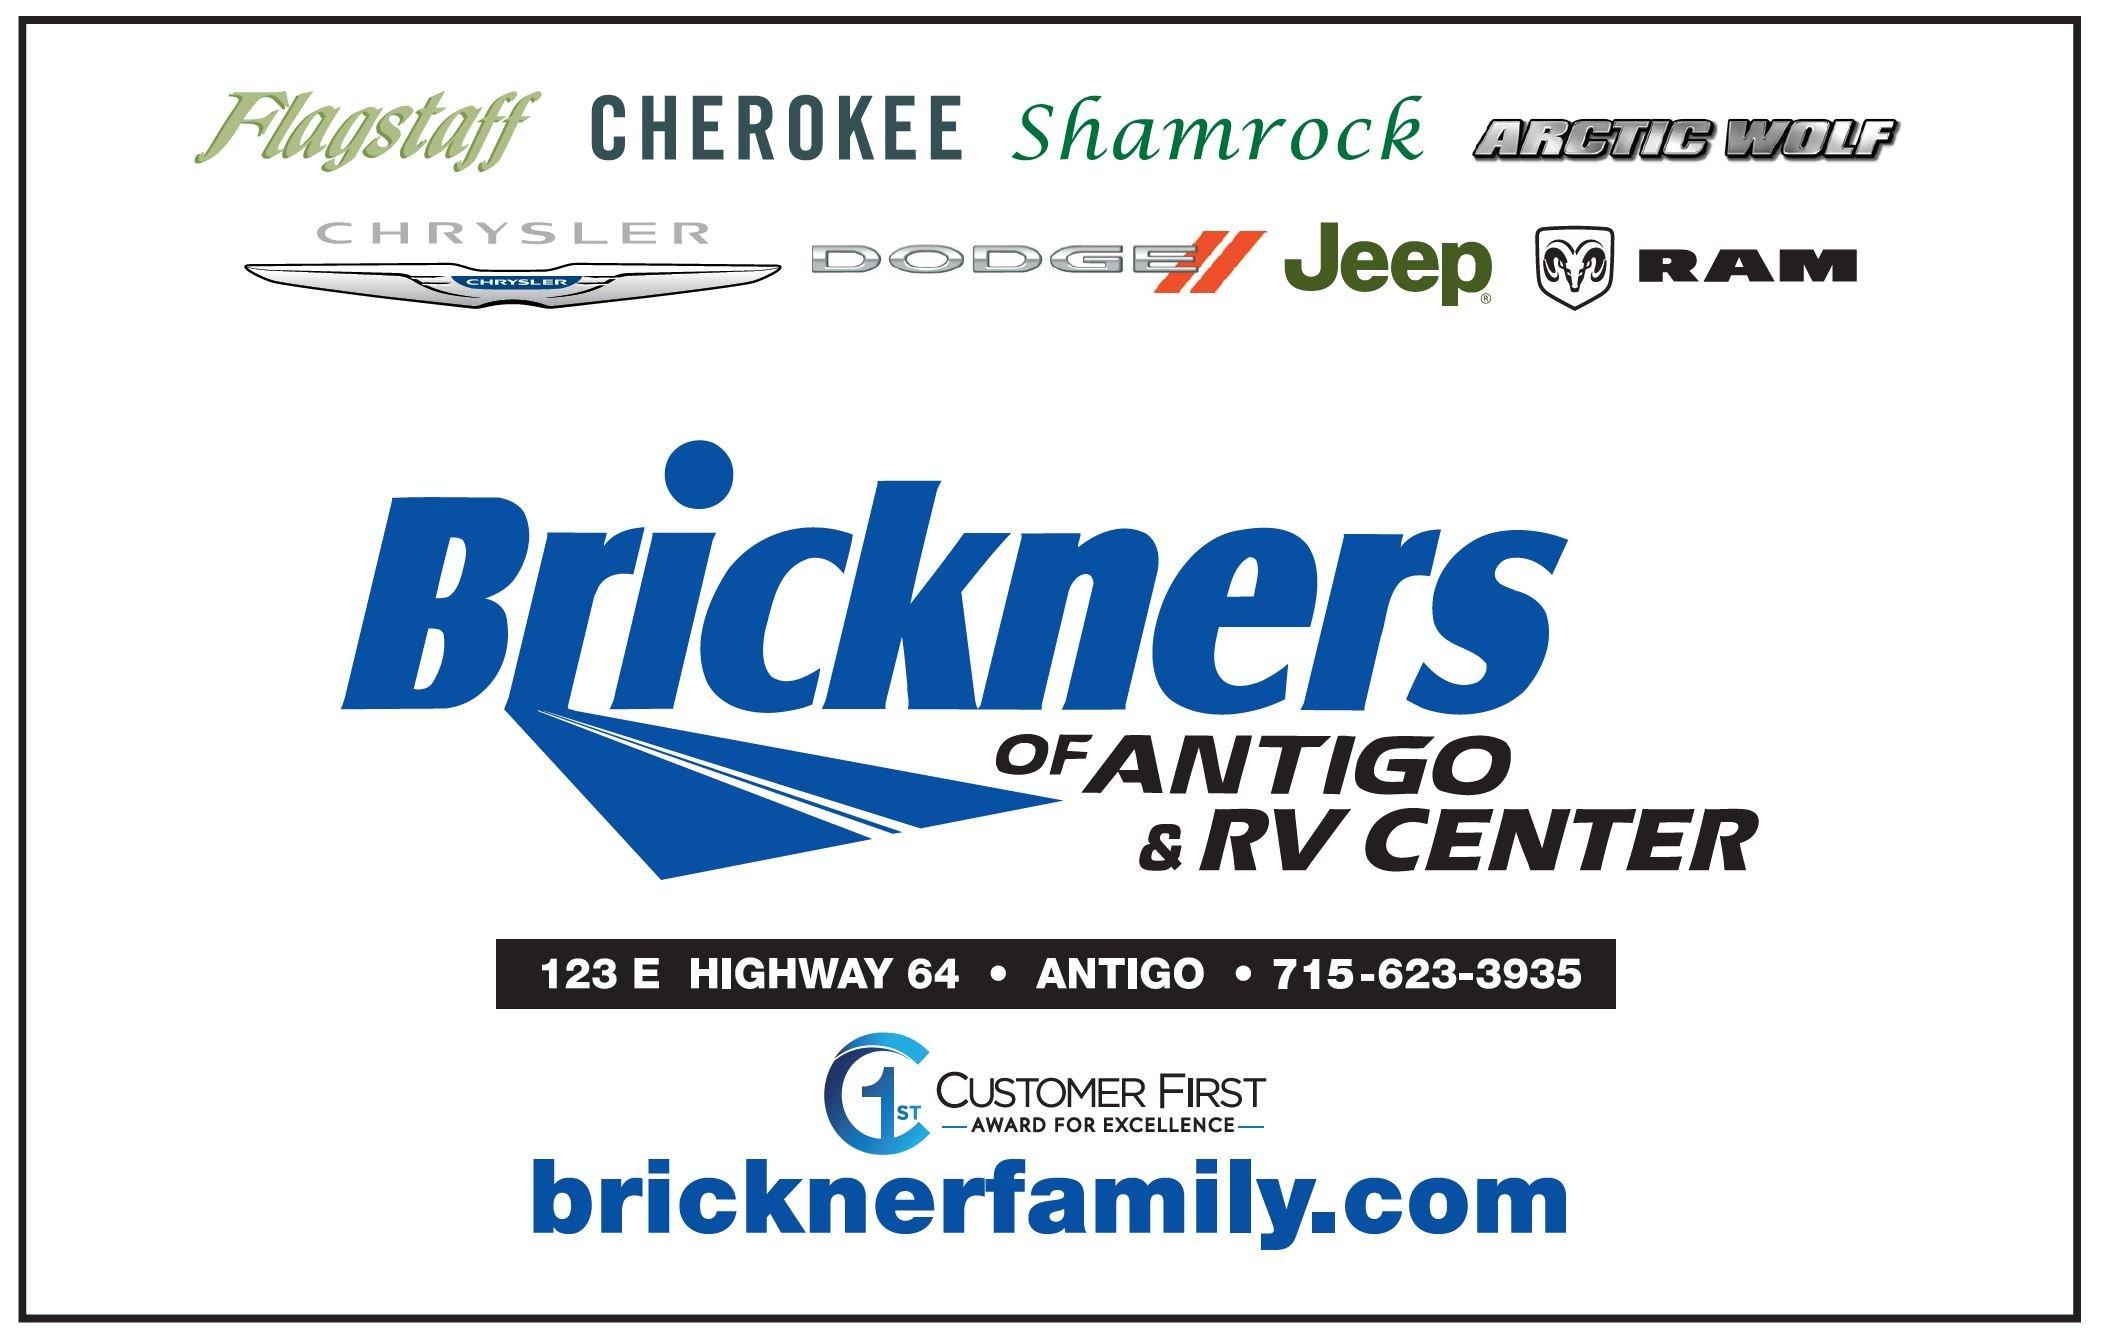 Brickners-SNIP